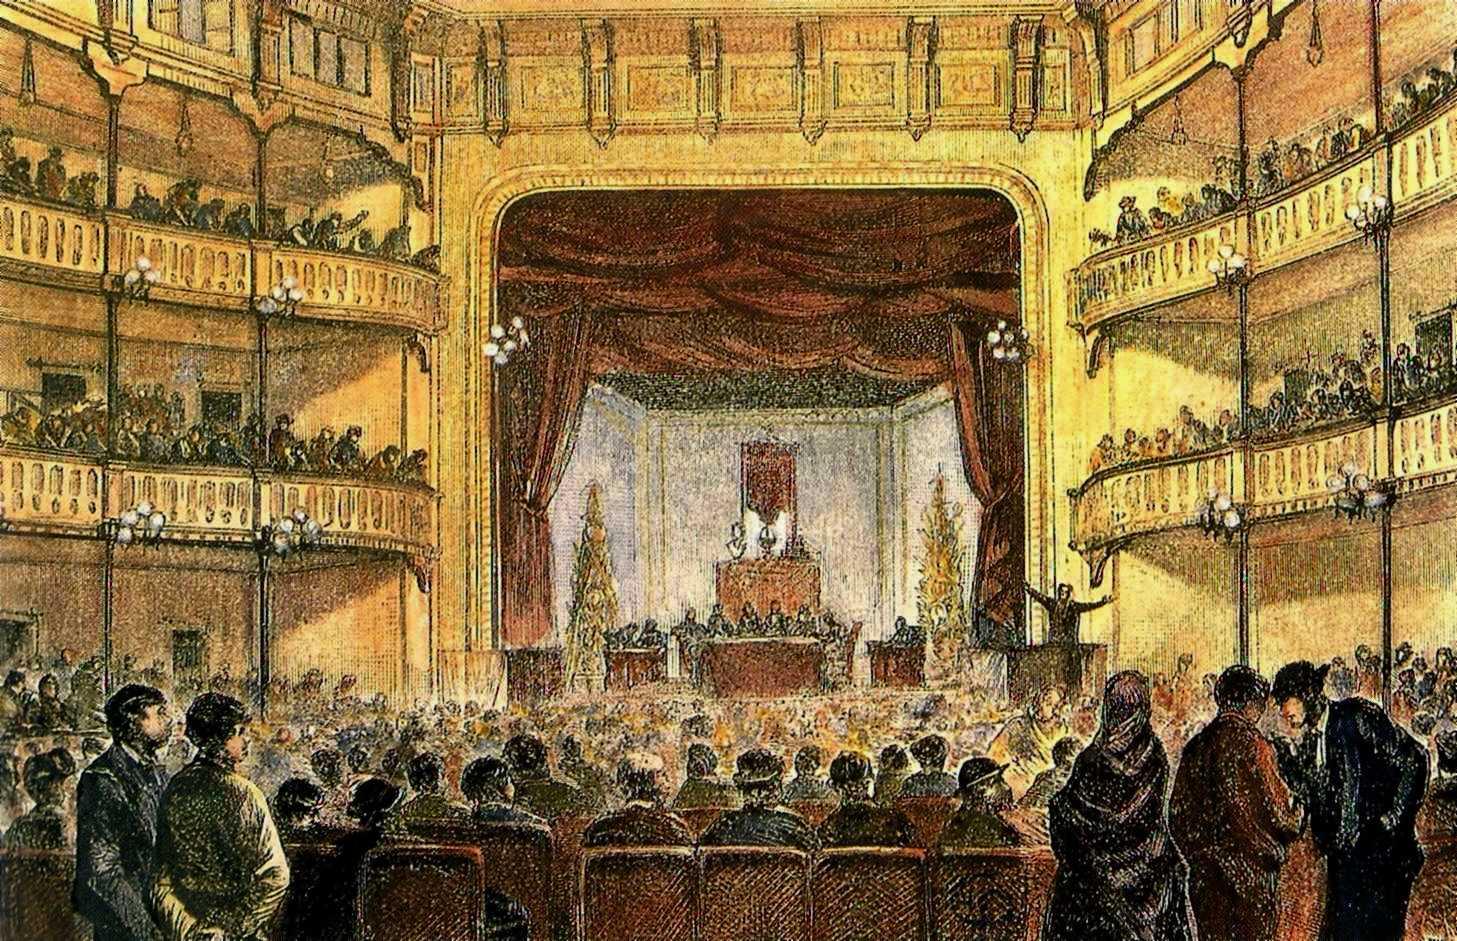 Congrés de Barcelona de 1870 al Teatre Circ Barceloní